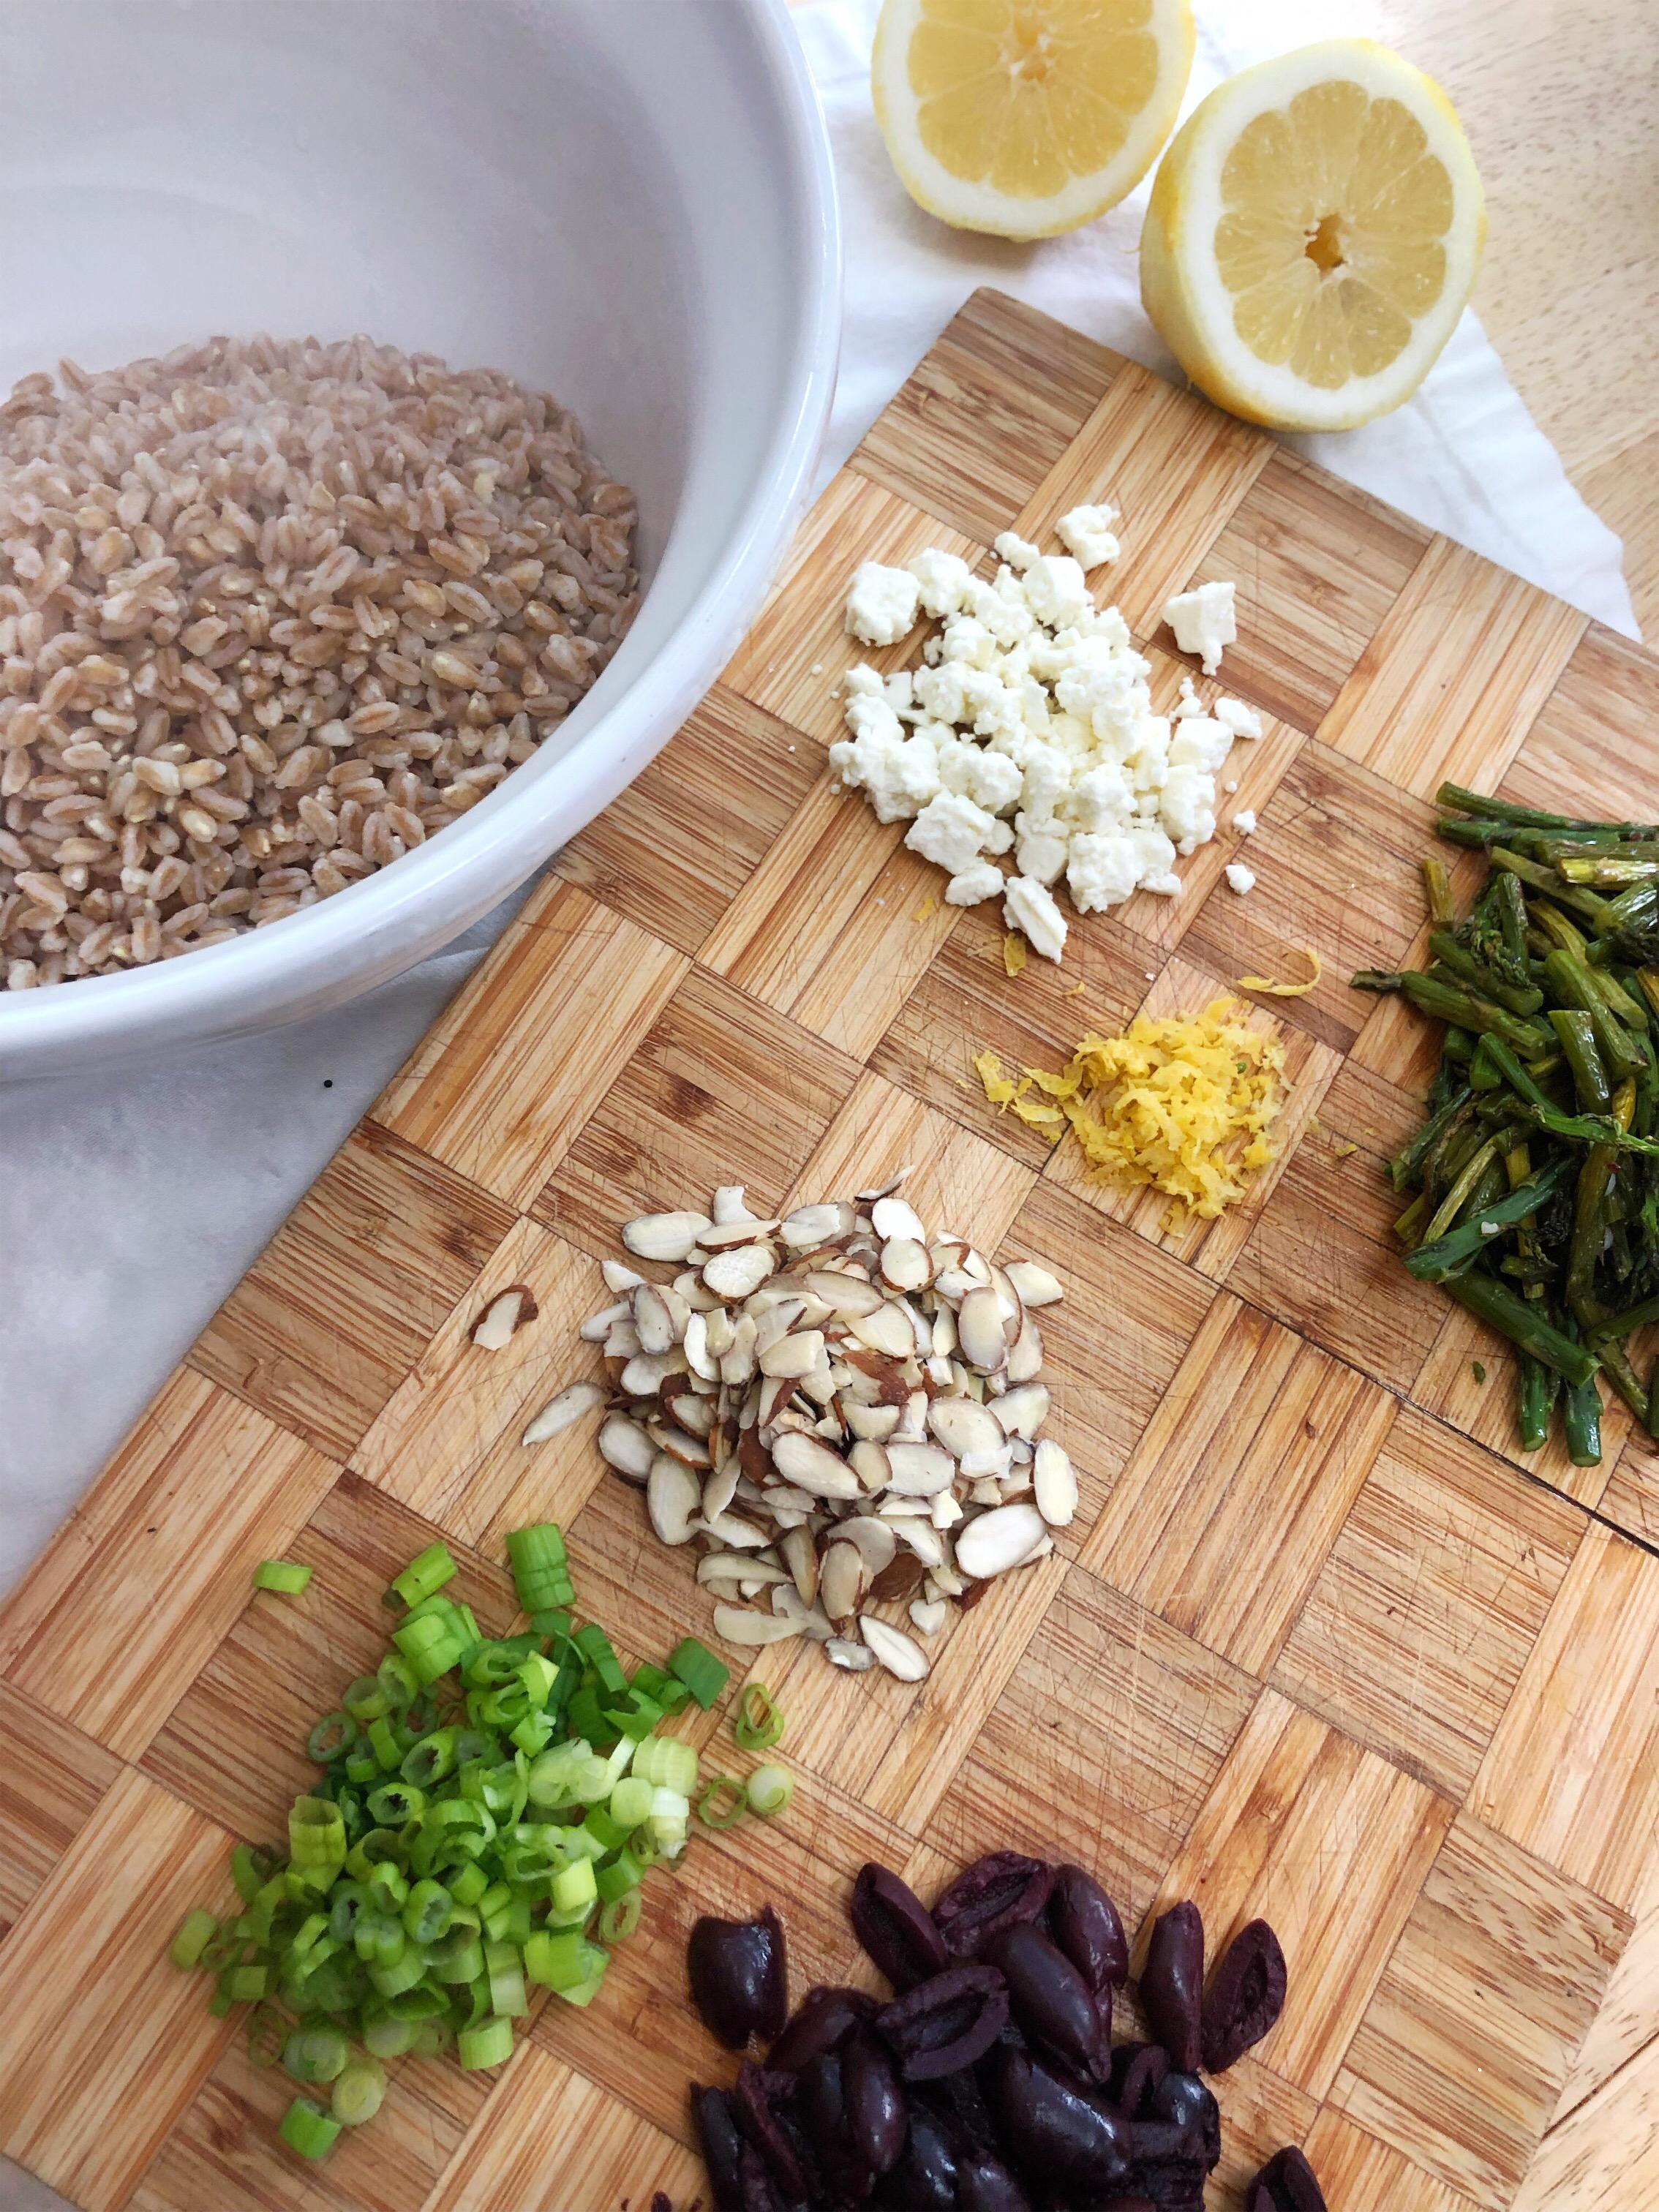 Spring Brunch Menu to make Mom's Day -www.ChefShayna.com